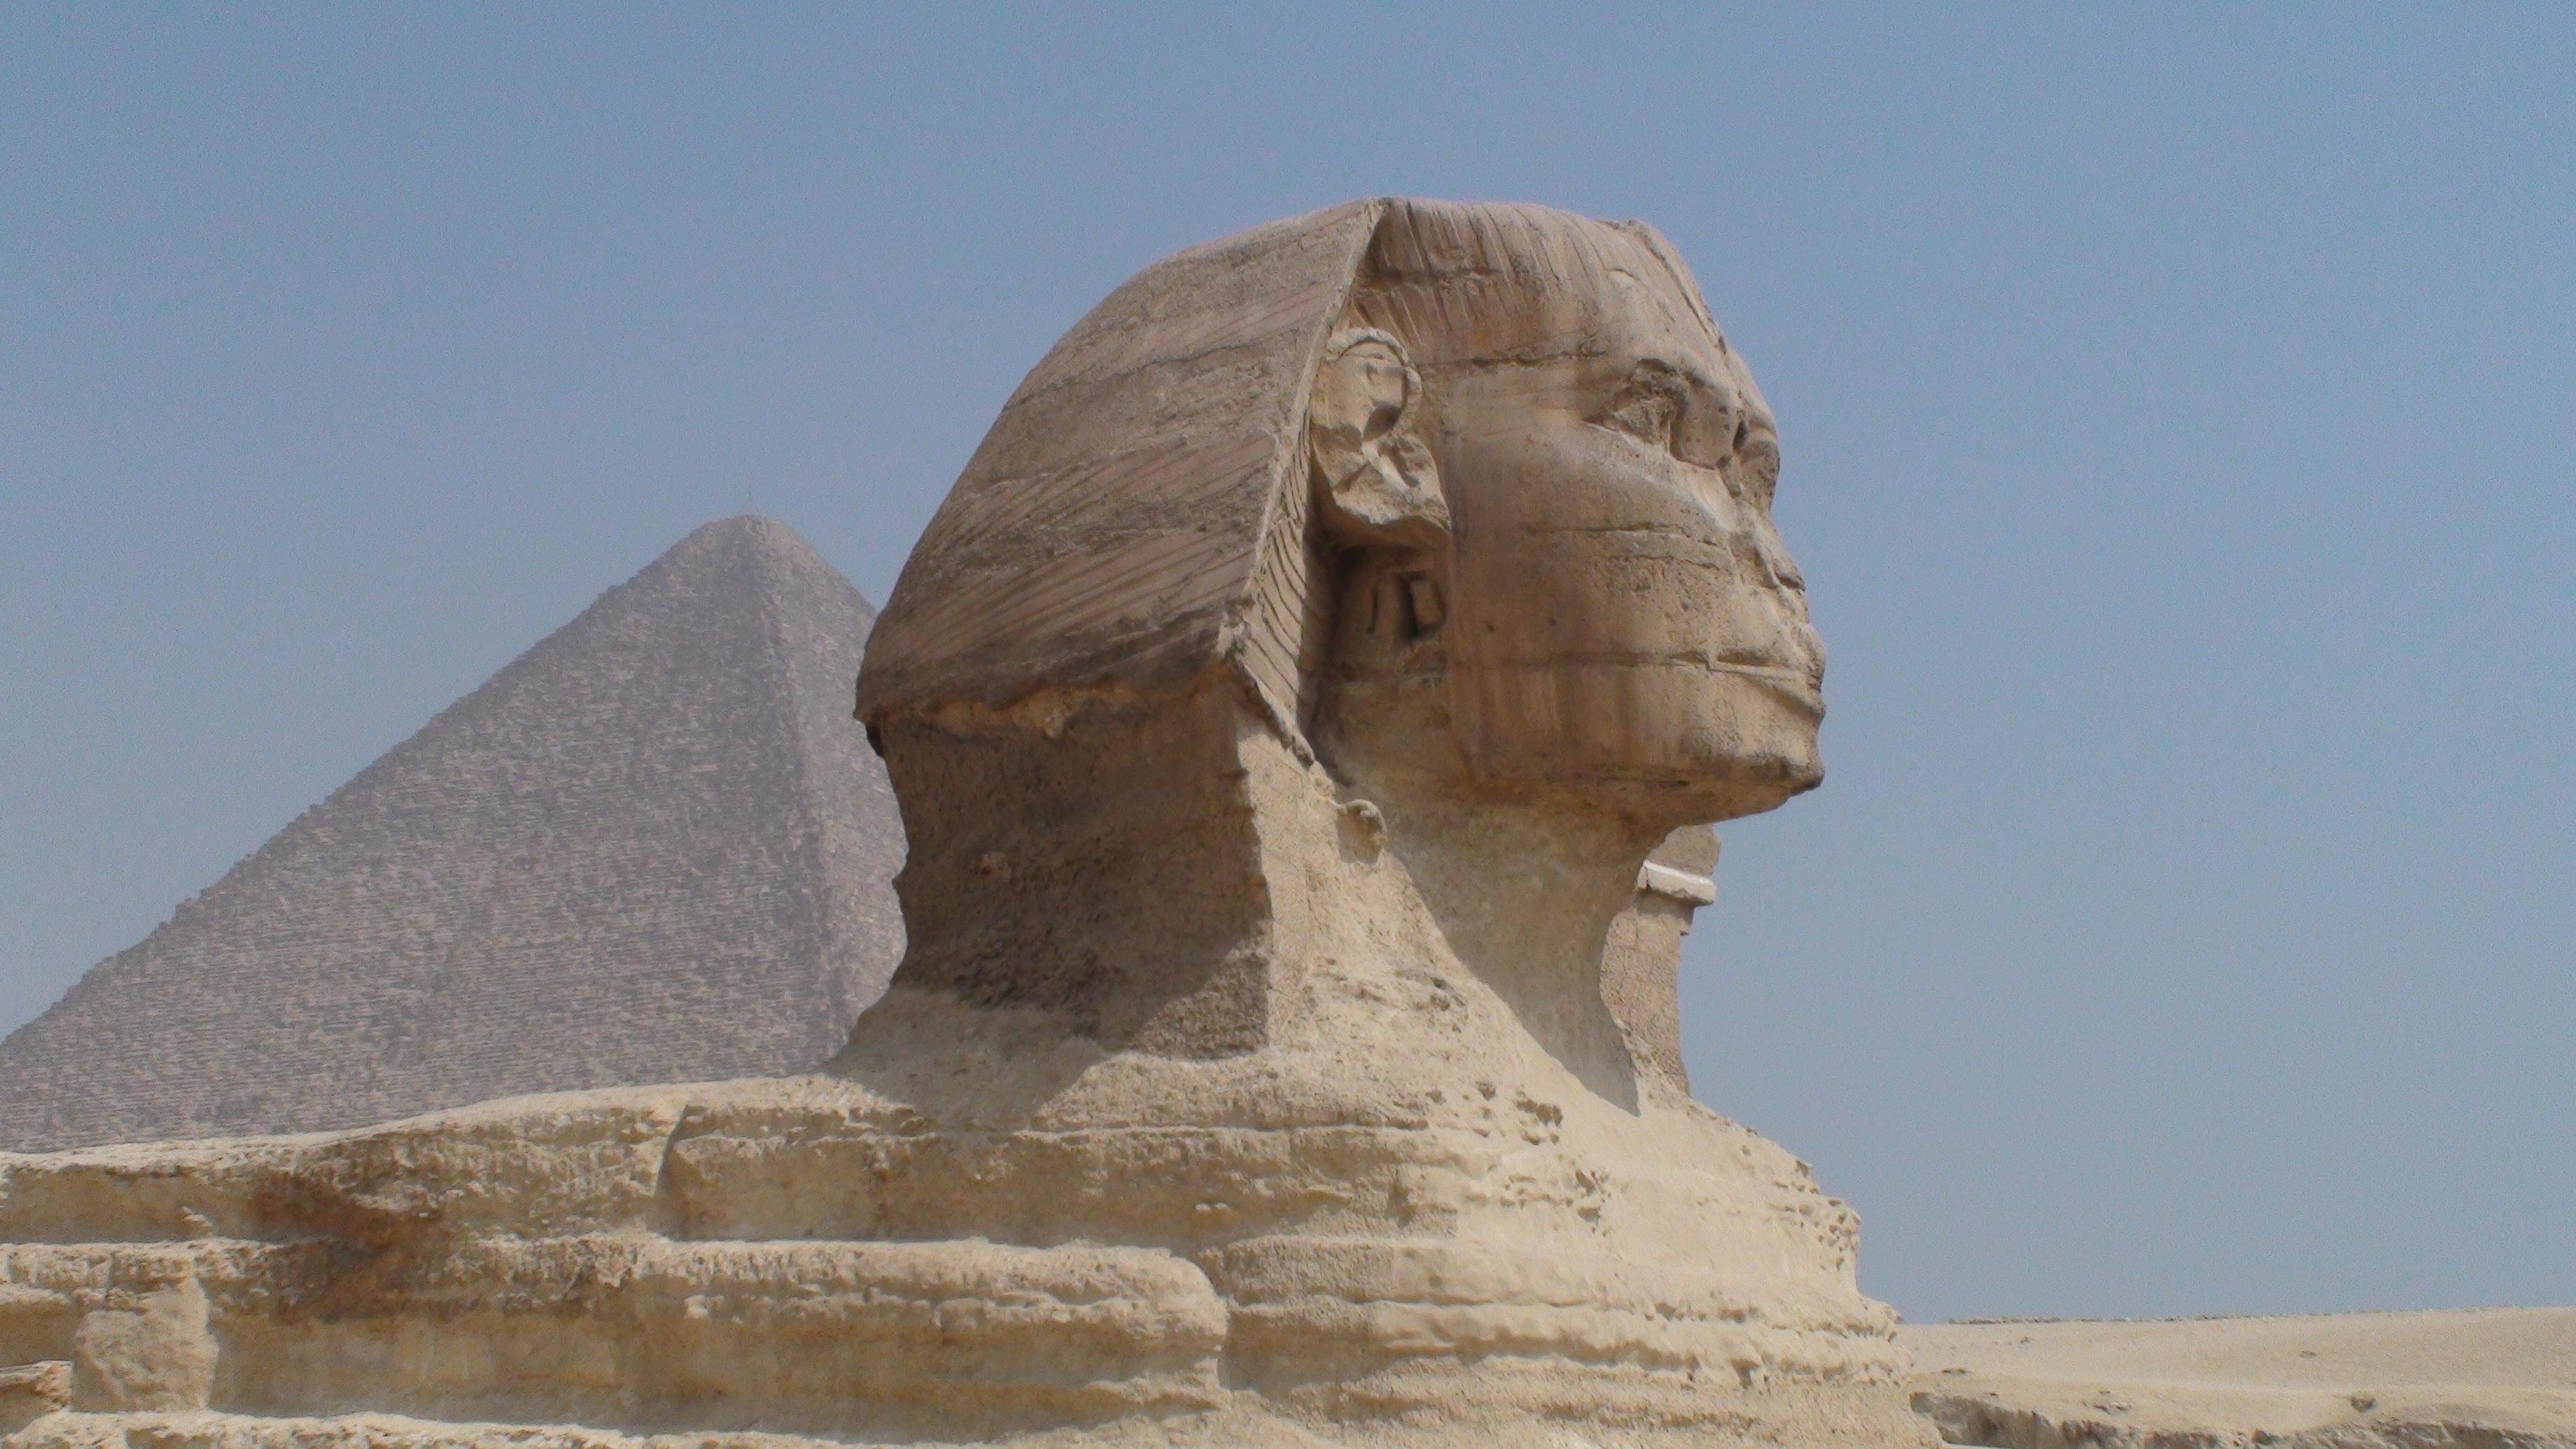 Gambar Pasir Batu Monumen Pembentukan Patung Lengkungan